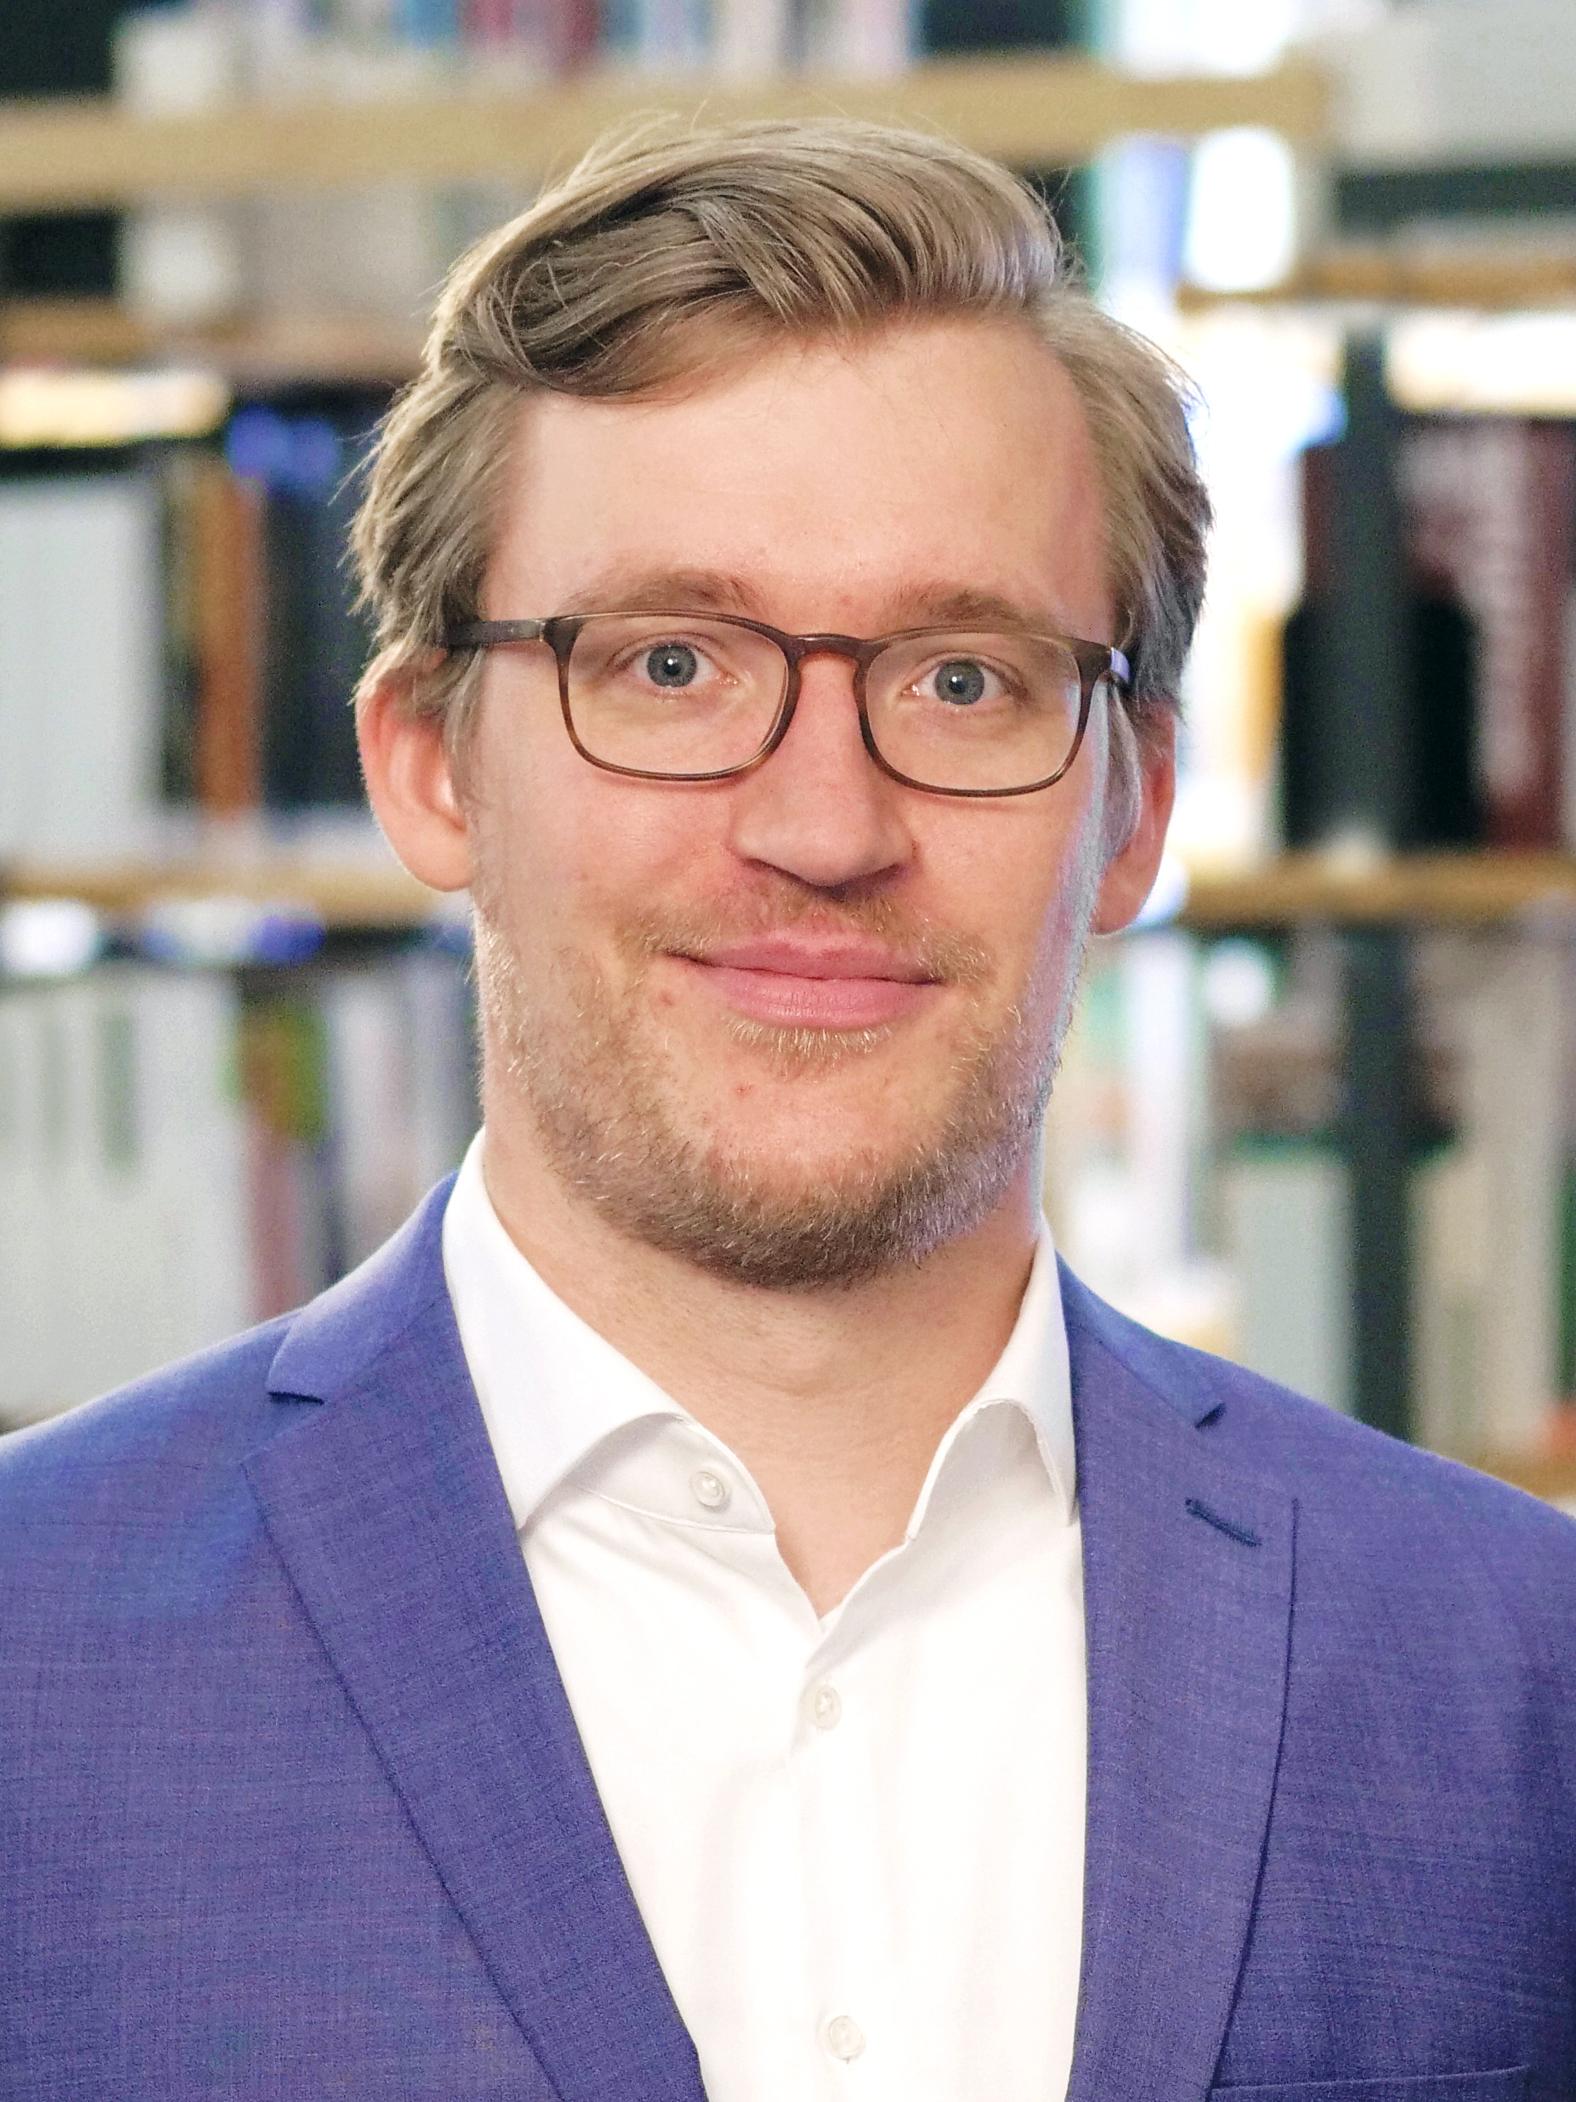 Jens Stappenbeck